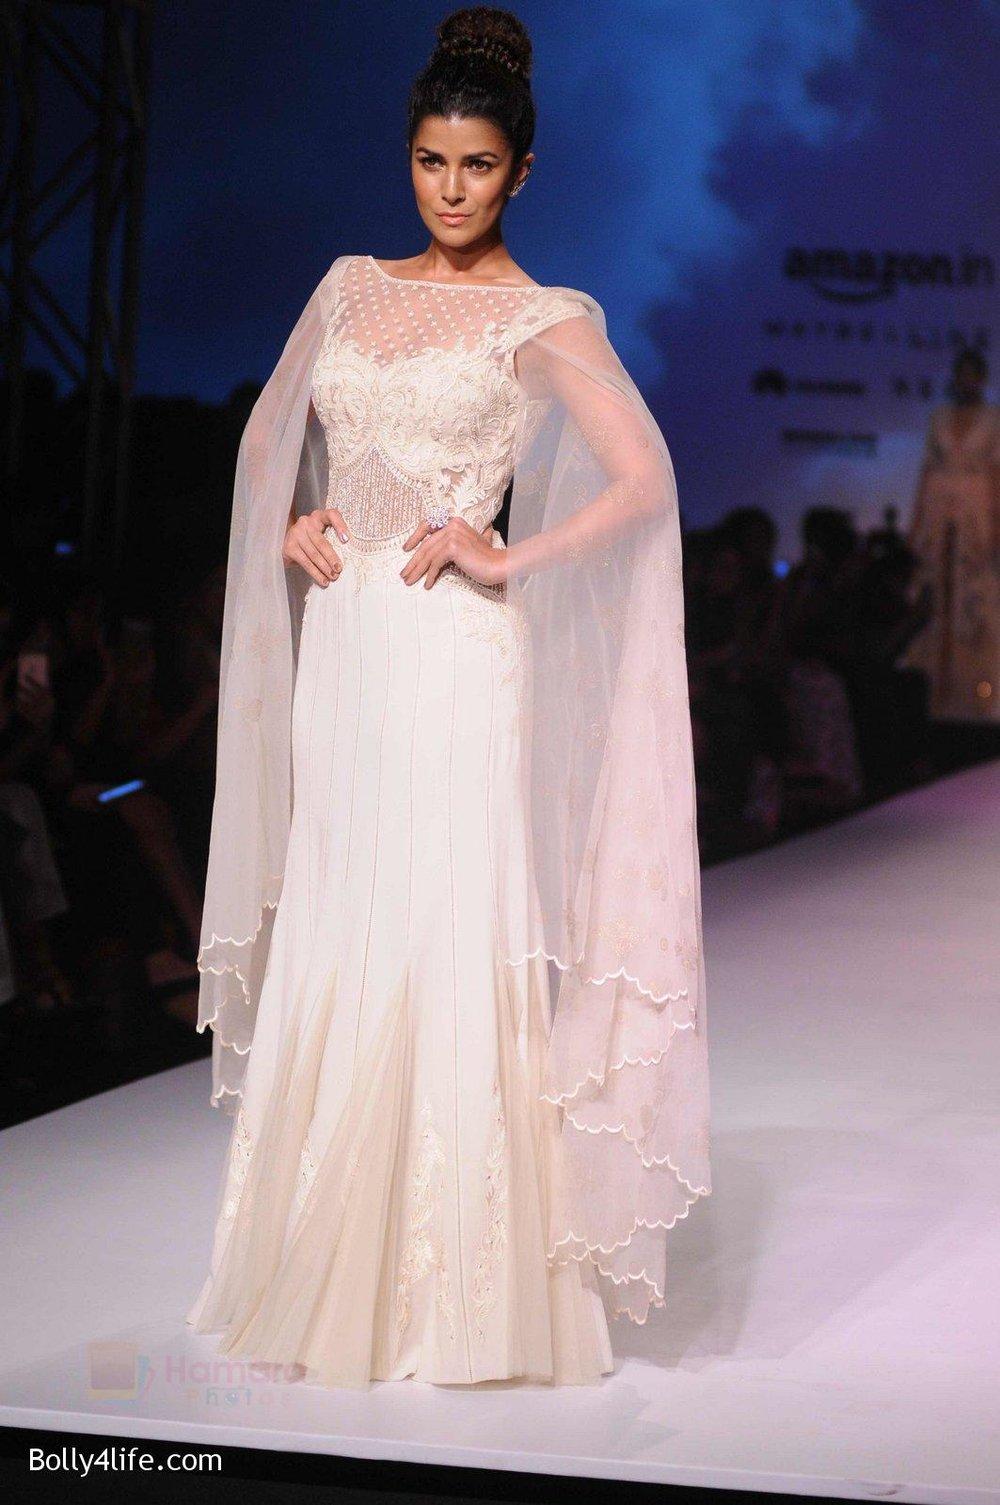 Nimrat-Kaur-walk-the-ramp-for-Mandira-Wrik_s-show-at-Amazon-India-Fashion-Week-on-15th-Oct-2016-47.jpg